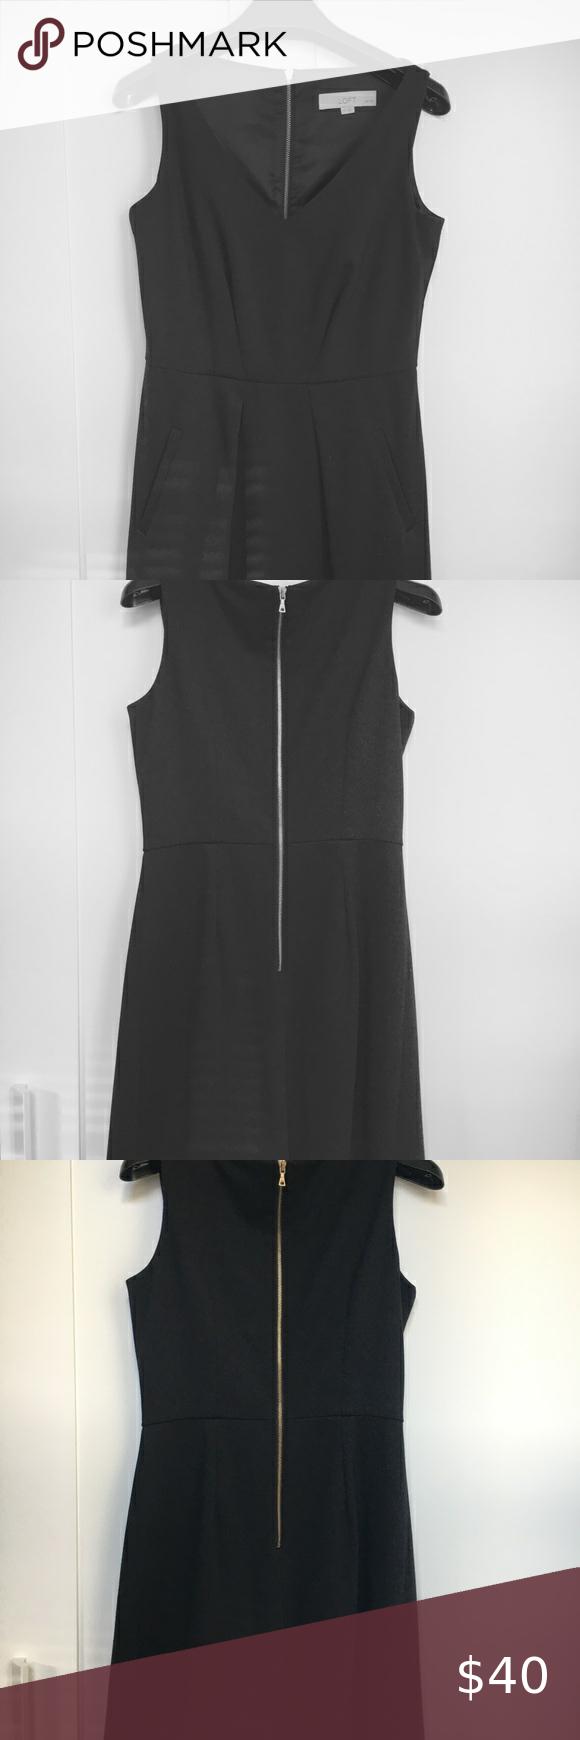 Ann Taylor Loft Black Dress With Pockets In 2020 Black Dress With Pockets Black Dress Dresses [ 1740 x 580 Pixel ]